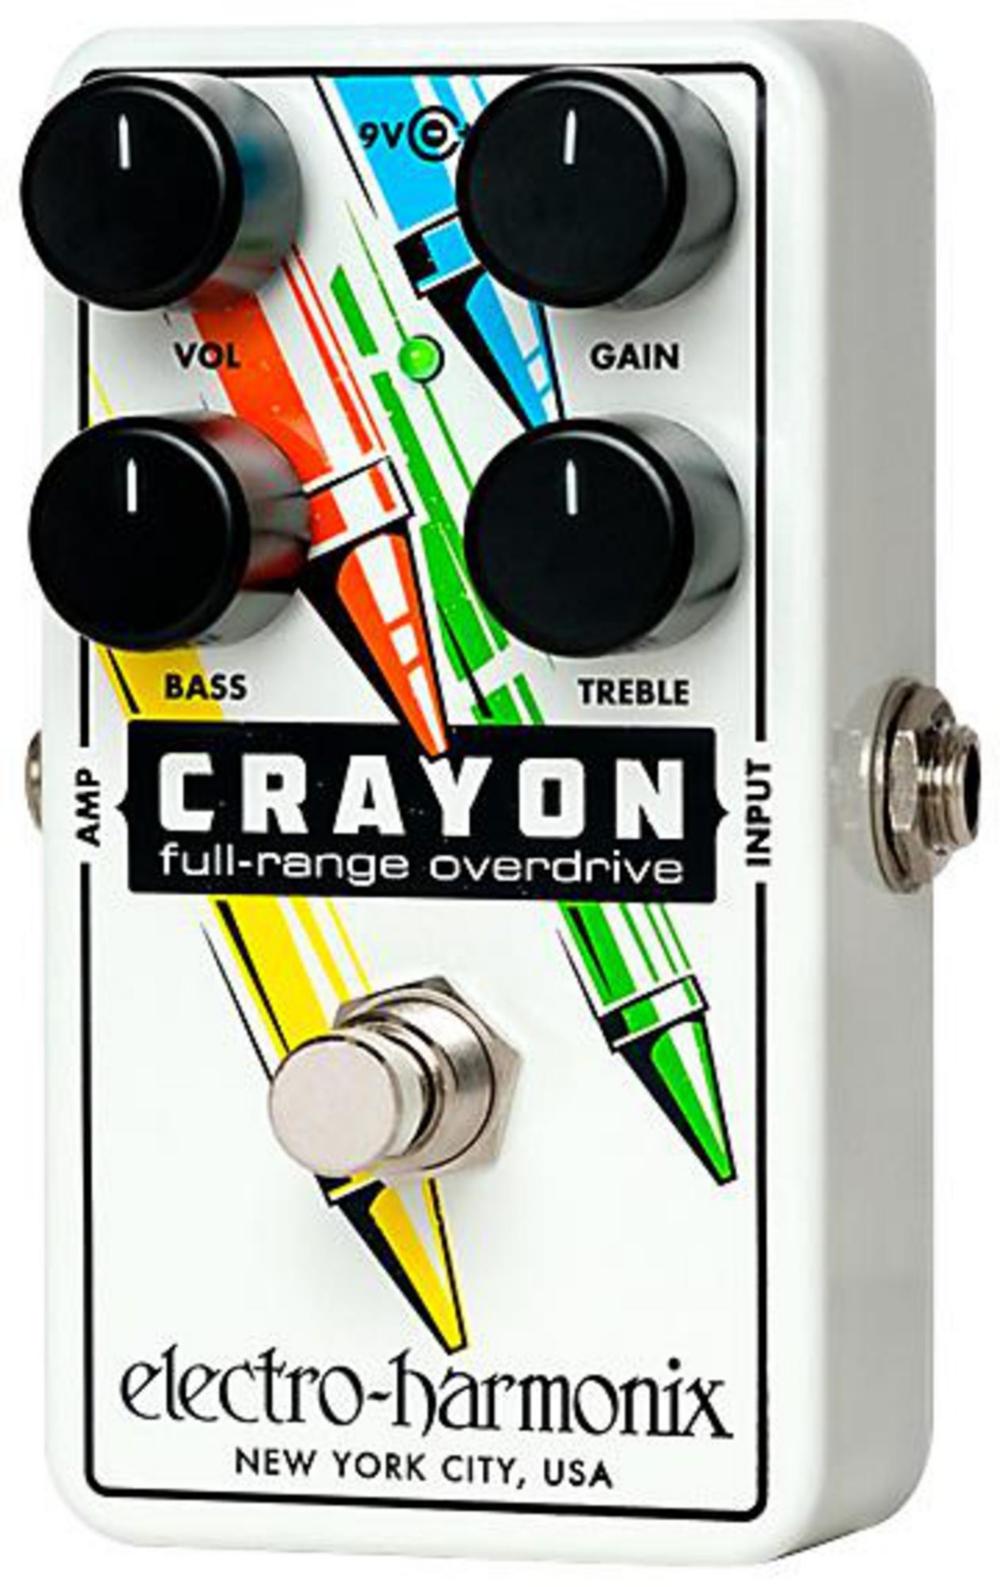 Electro-Harmonix CRAYON Full Range Overdrive 76 by Electro-Harmonix